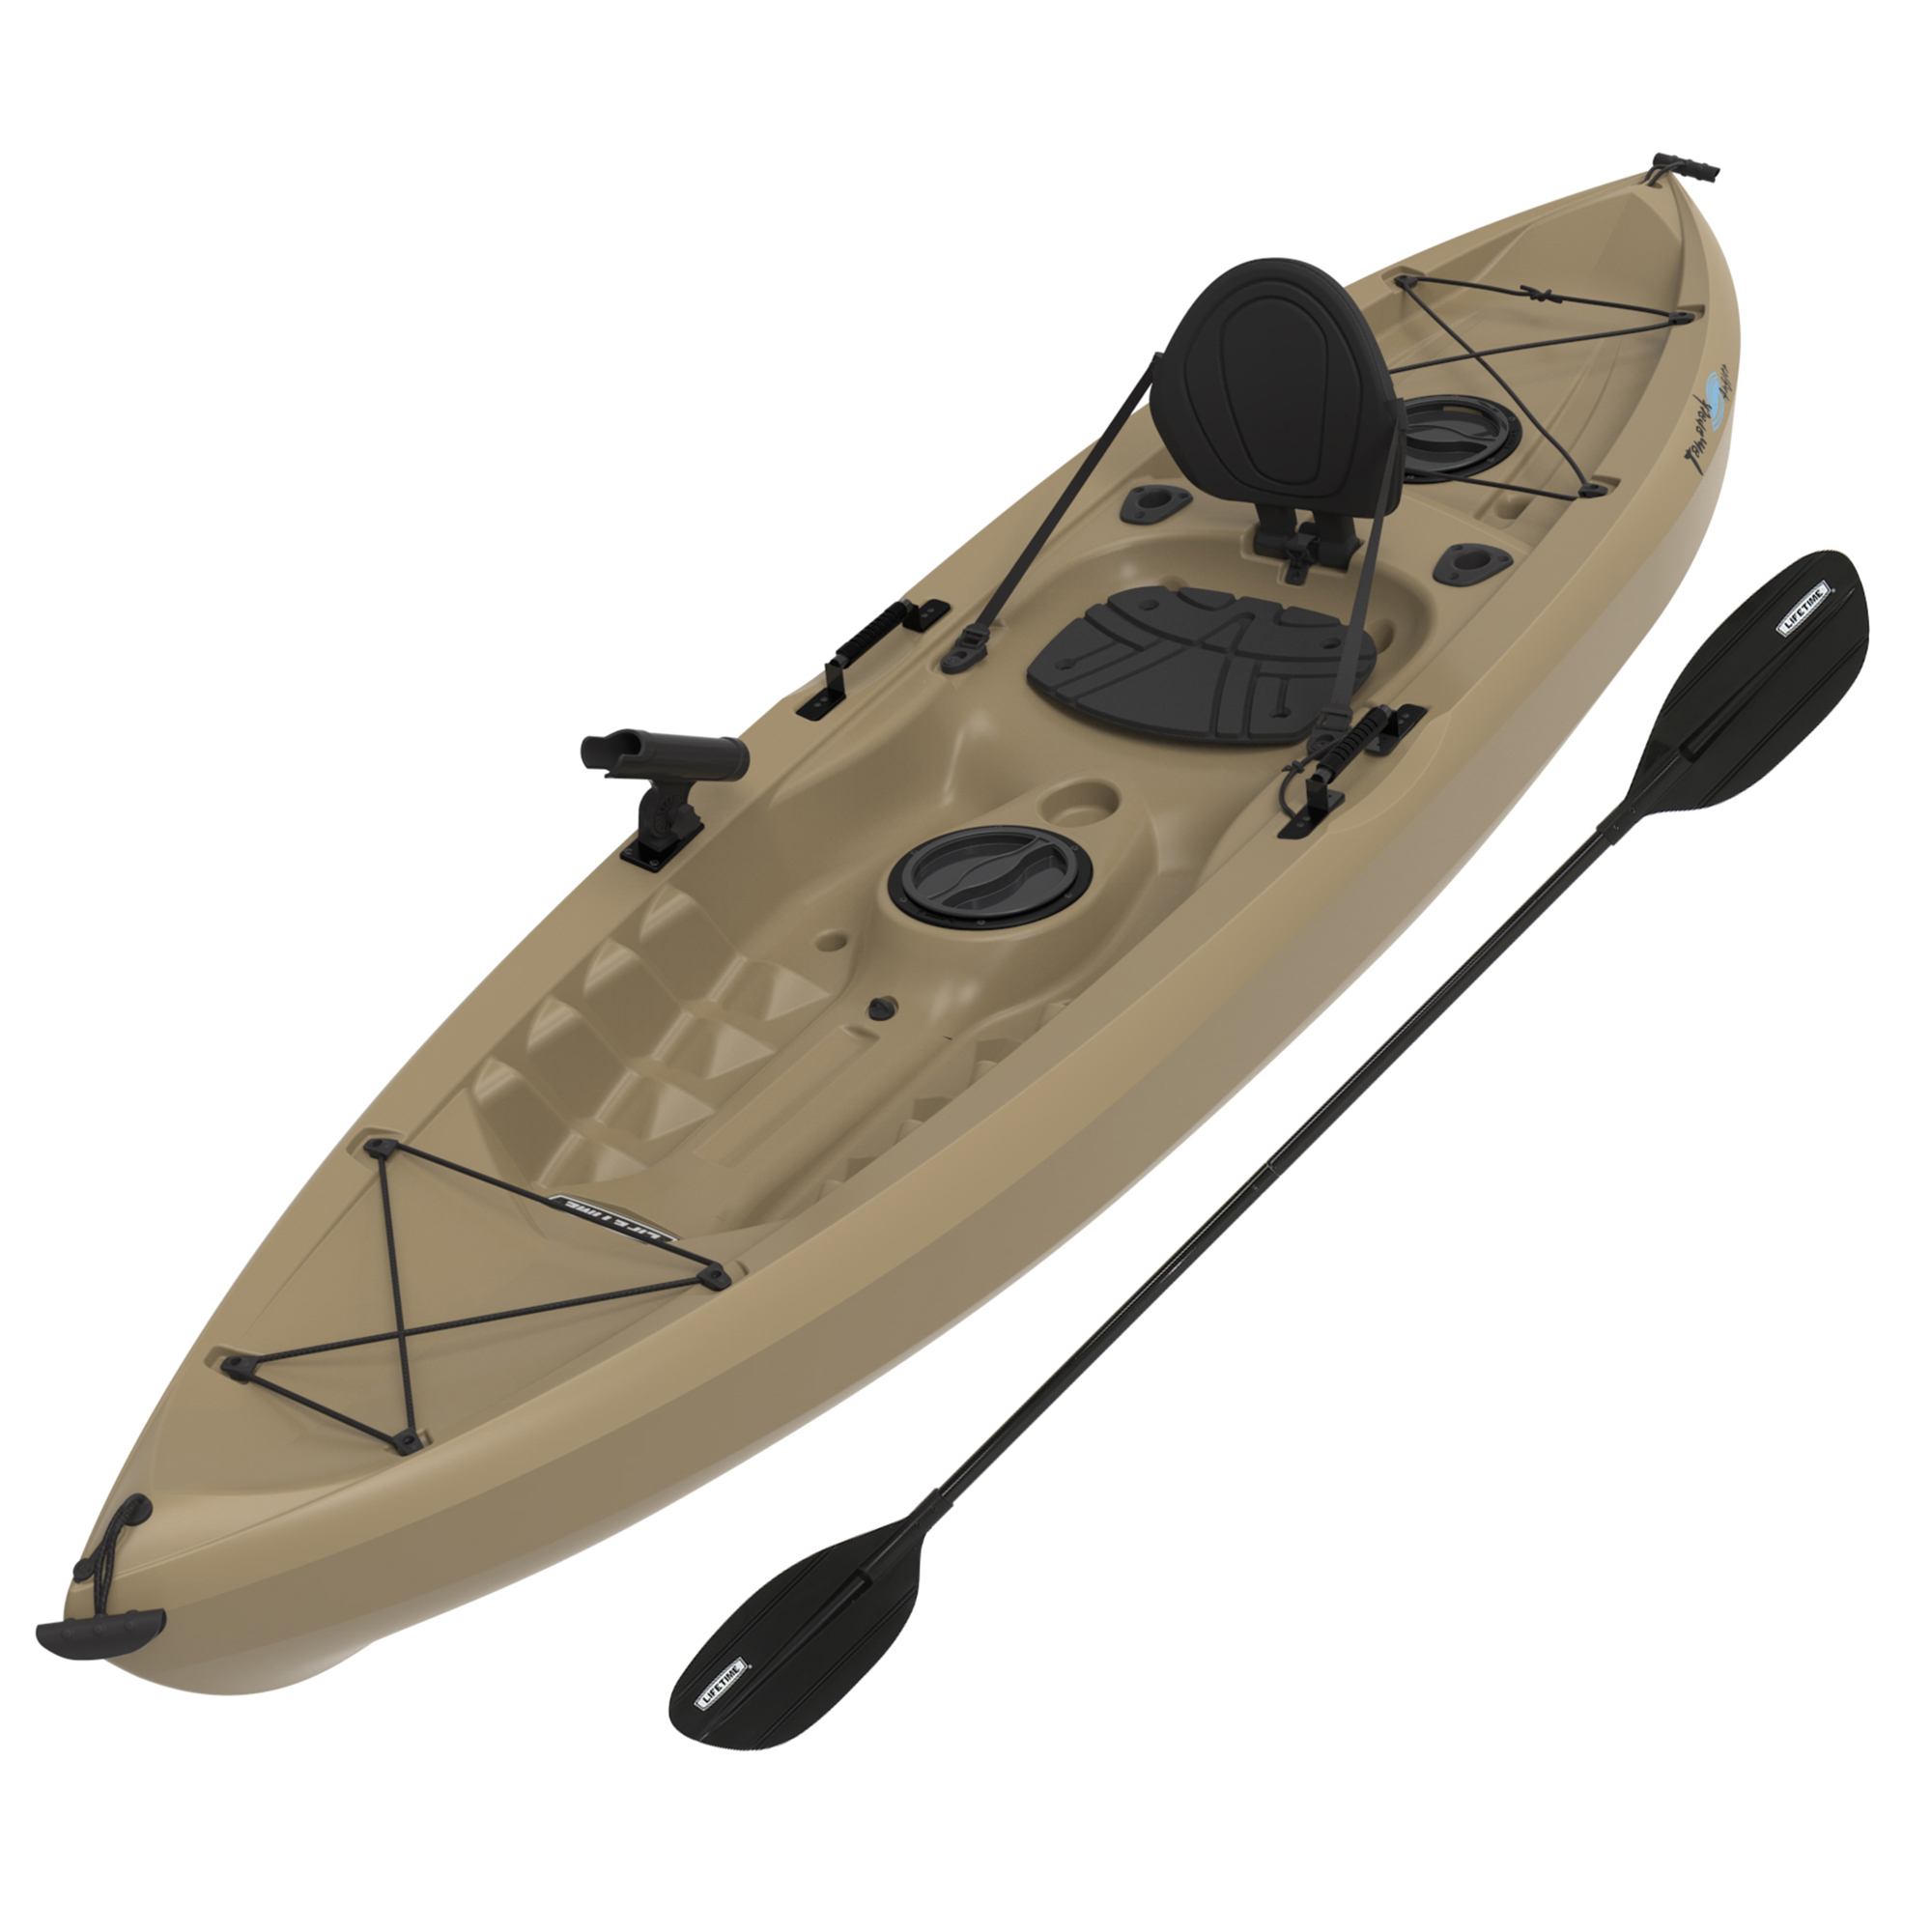 Lifetime Tamarack Angler 100 Fishing Kayak (Paddle Included) by Lifetime Products